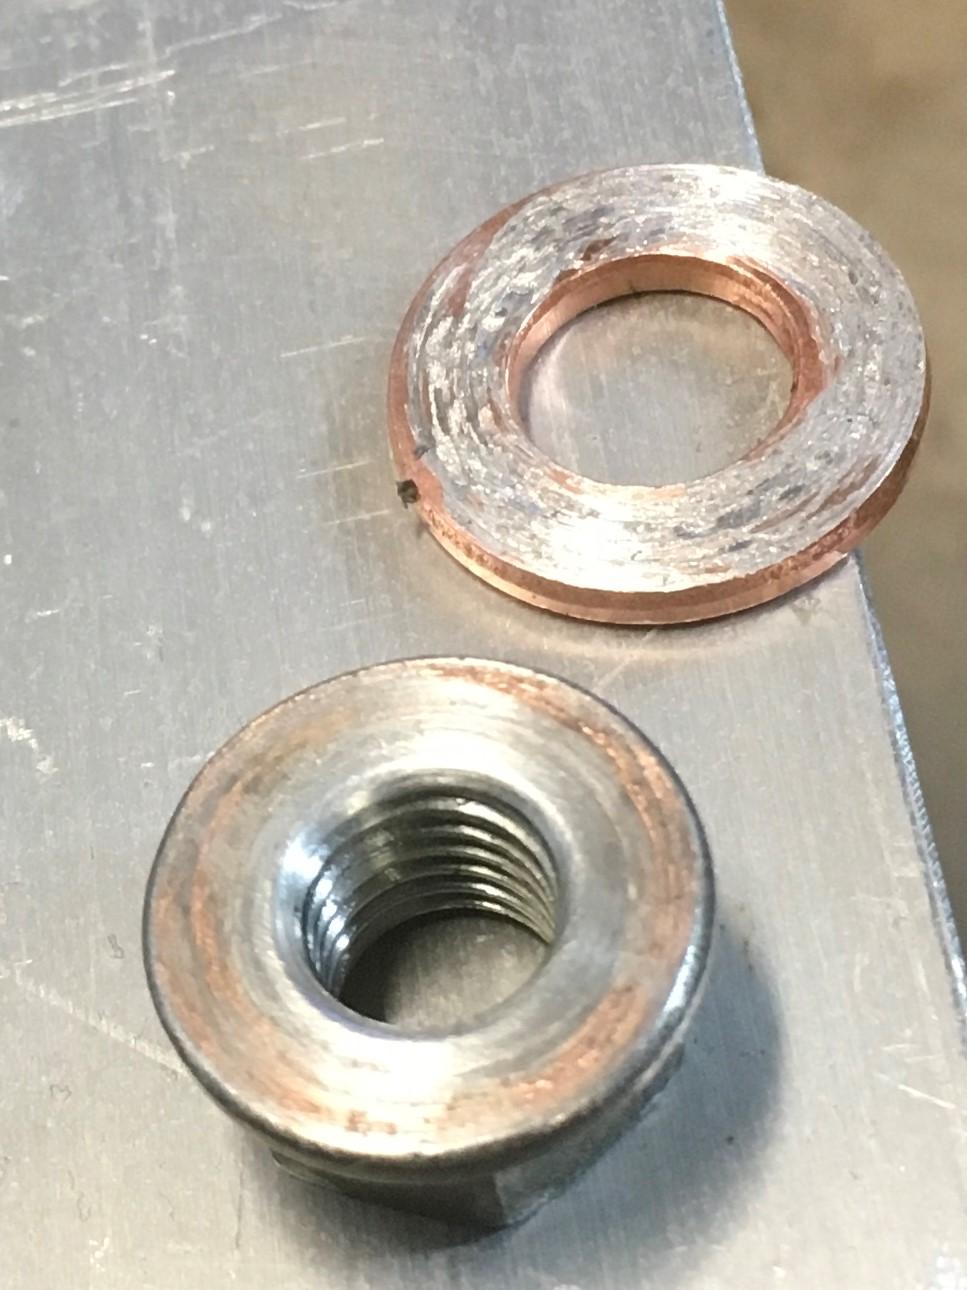 Silicone_Sealant_Post_Torque_Copper_Washer_Bottom_2_001.JPG